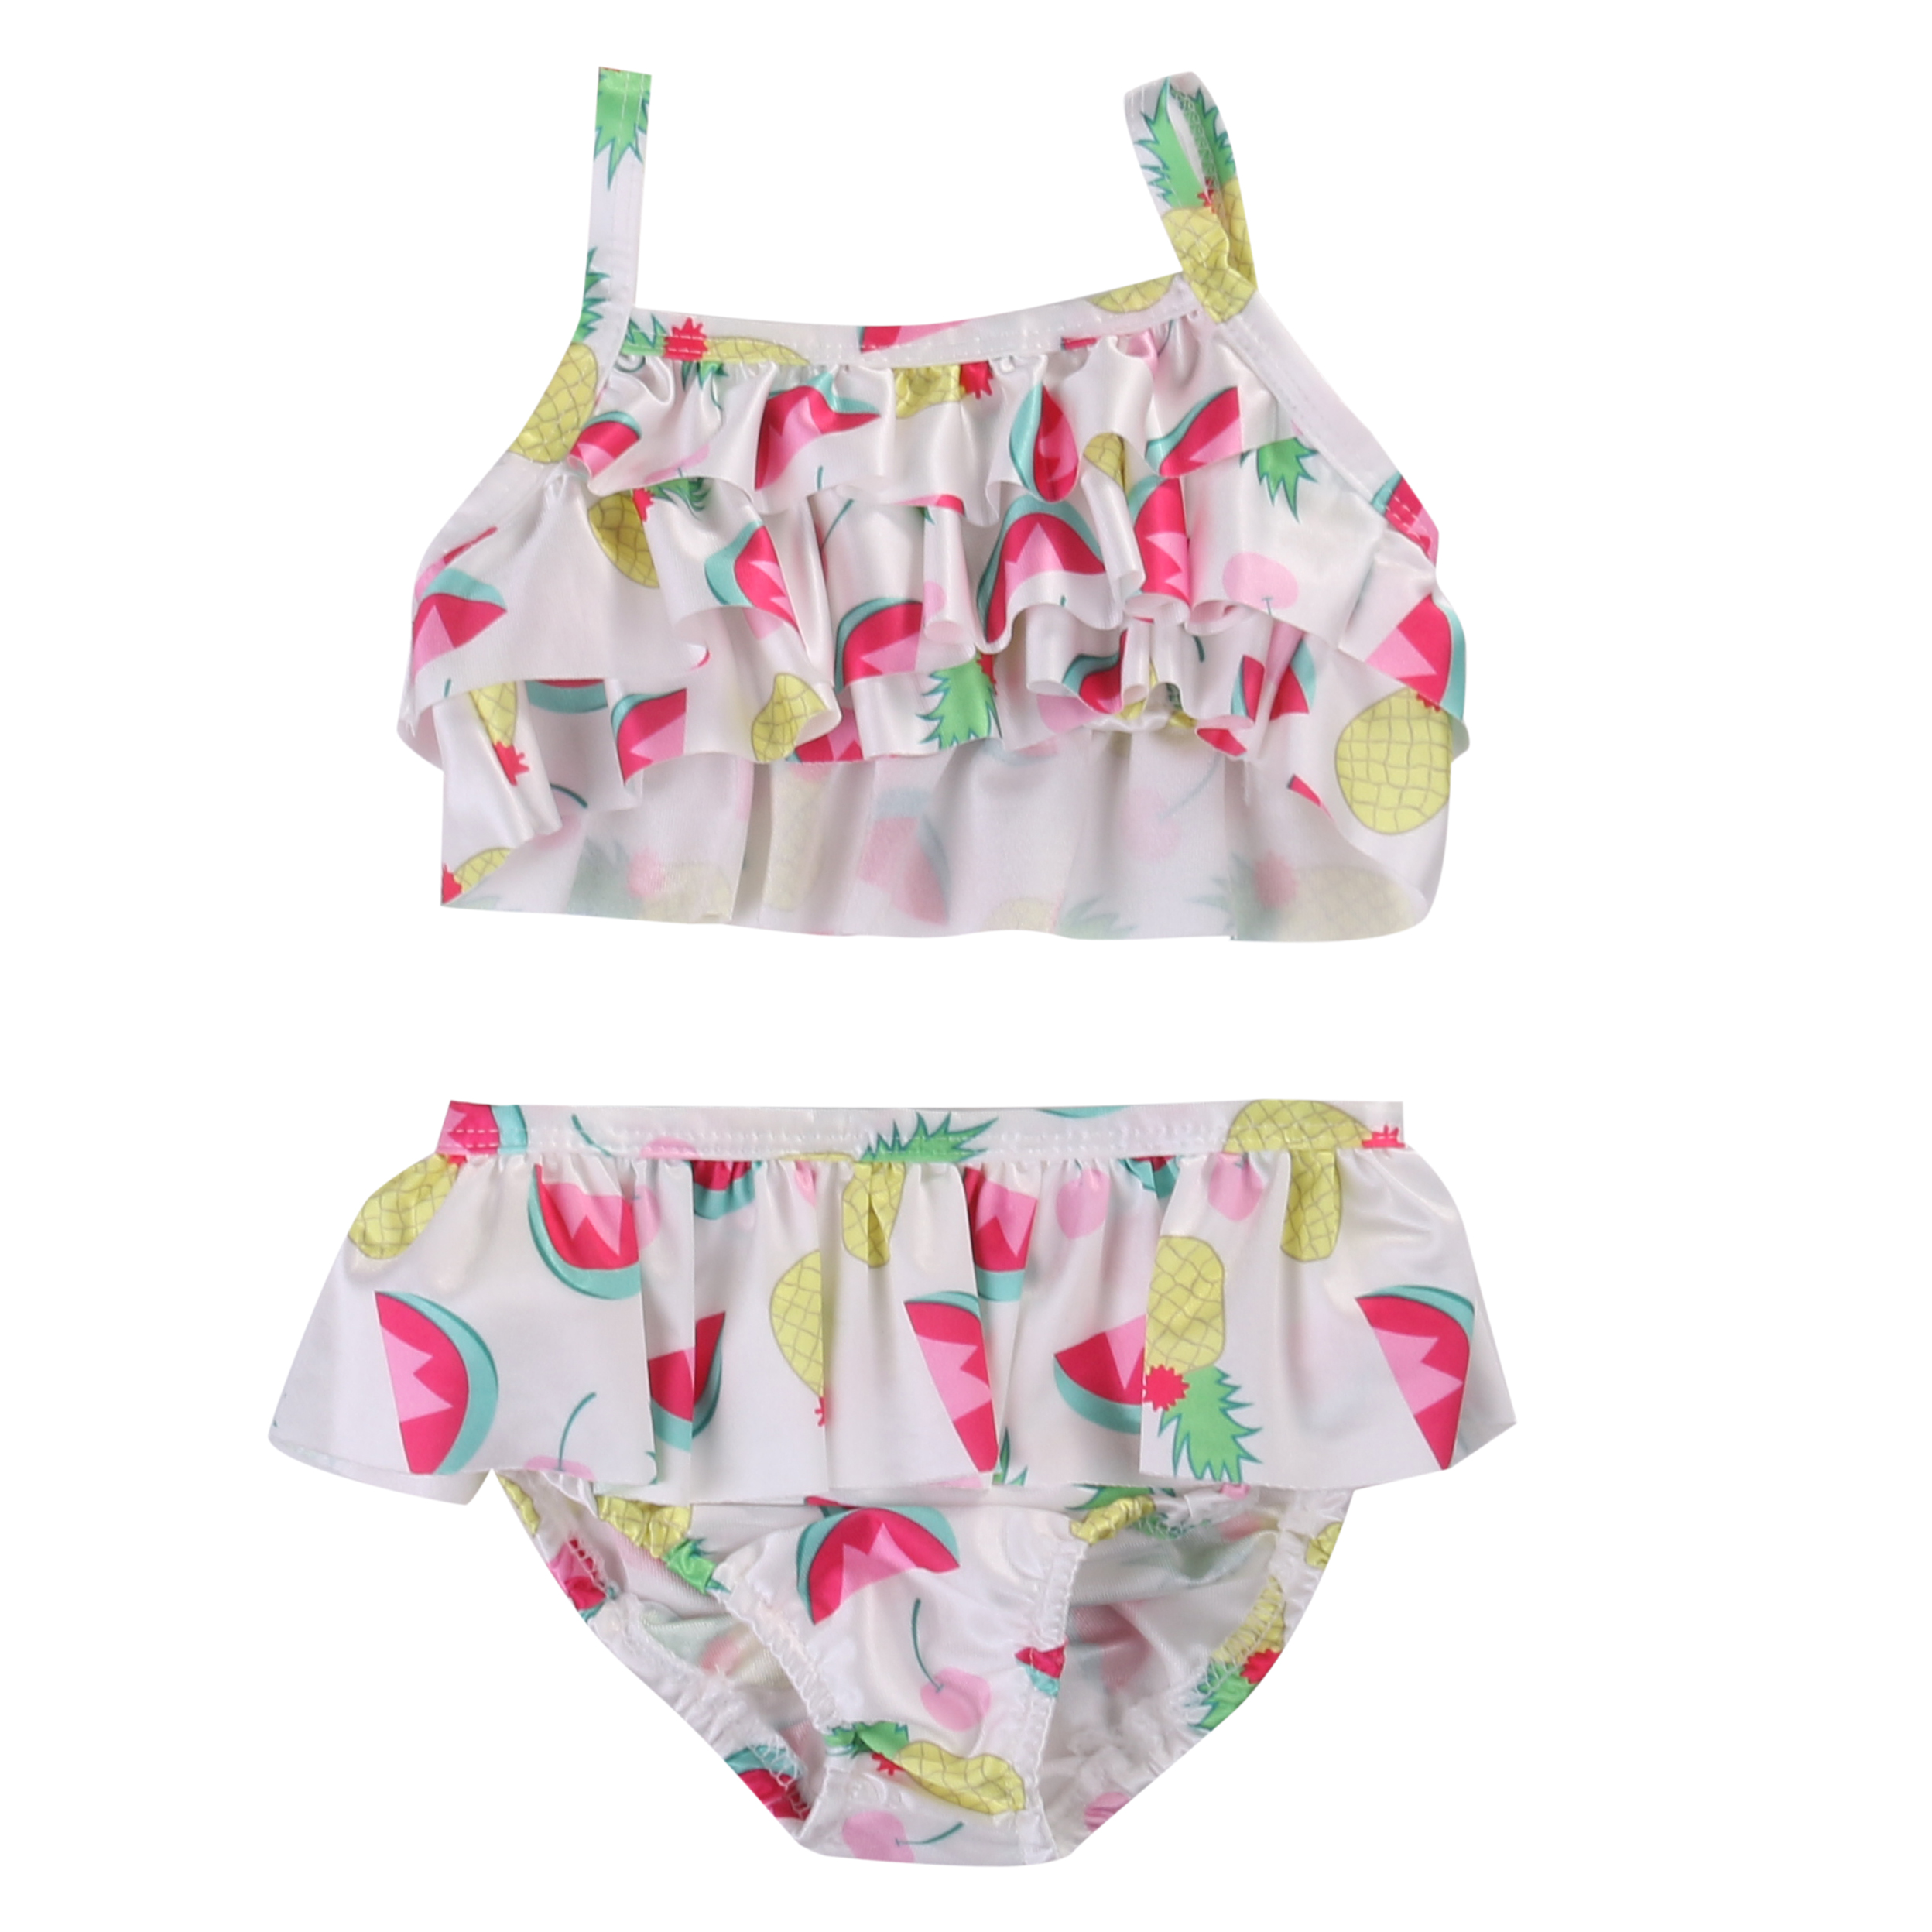 Newborn Kids Baby Girls Clothes Set Tankini Bikini Swimwear Tops